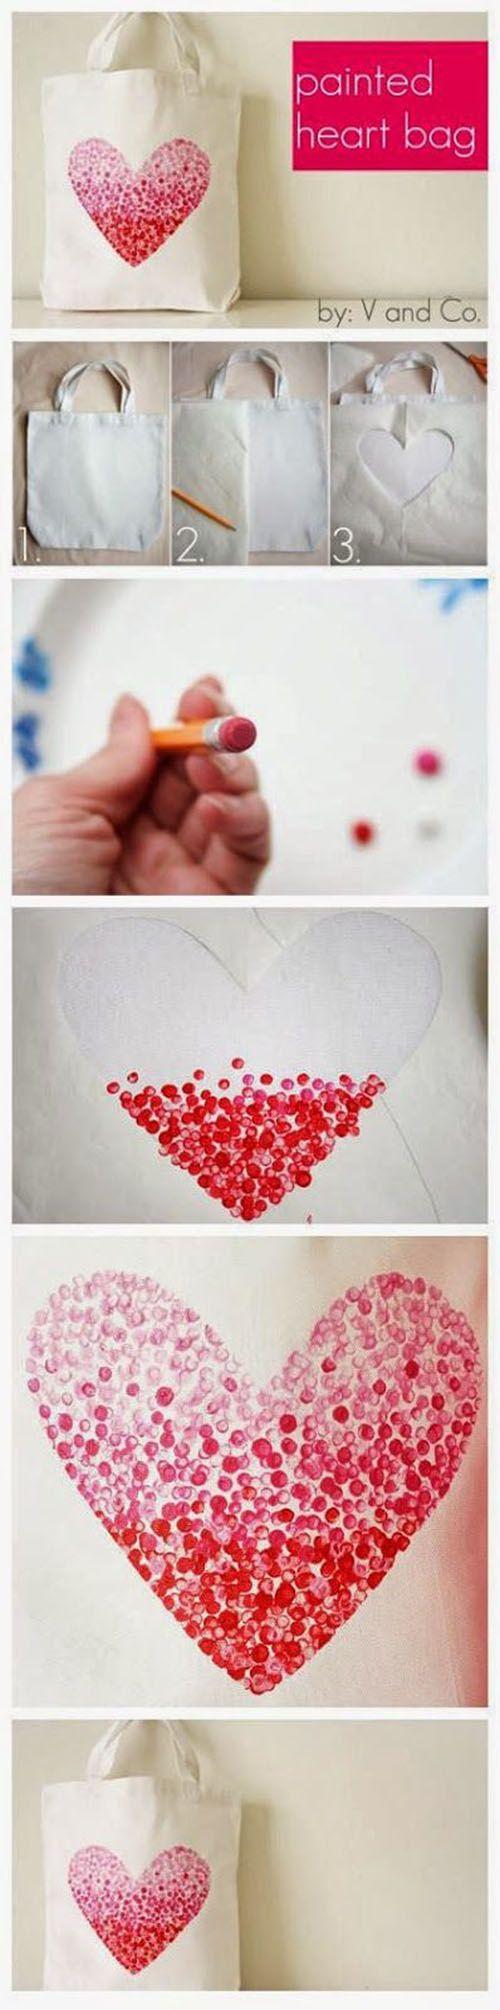 Painted Heart Bag | DIY & Crafts Tutorials. Maureen A Gonta DDS PC  - pediatric dentist in Corning, NY @ http://www.drgonta4kids.com